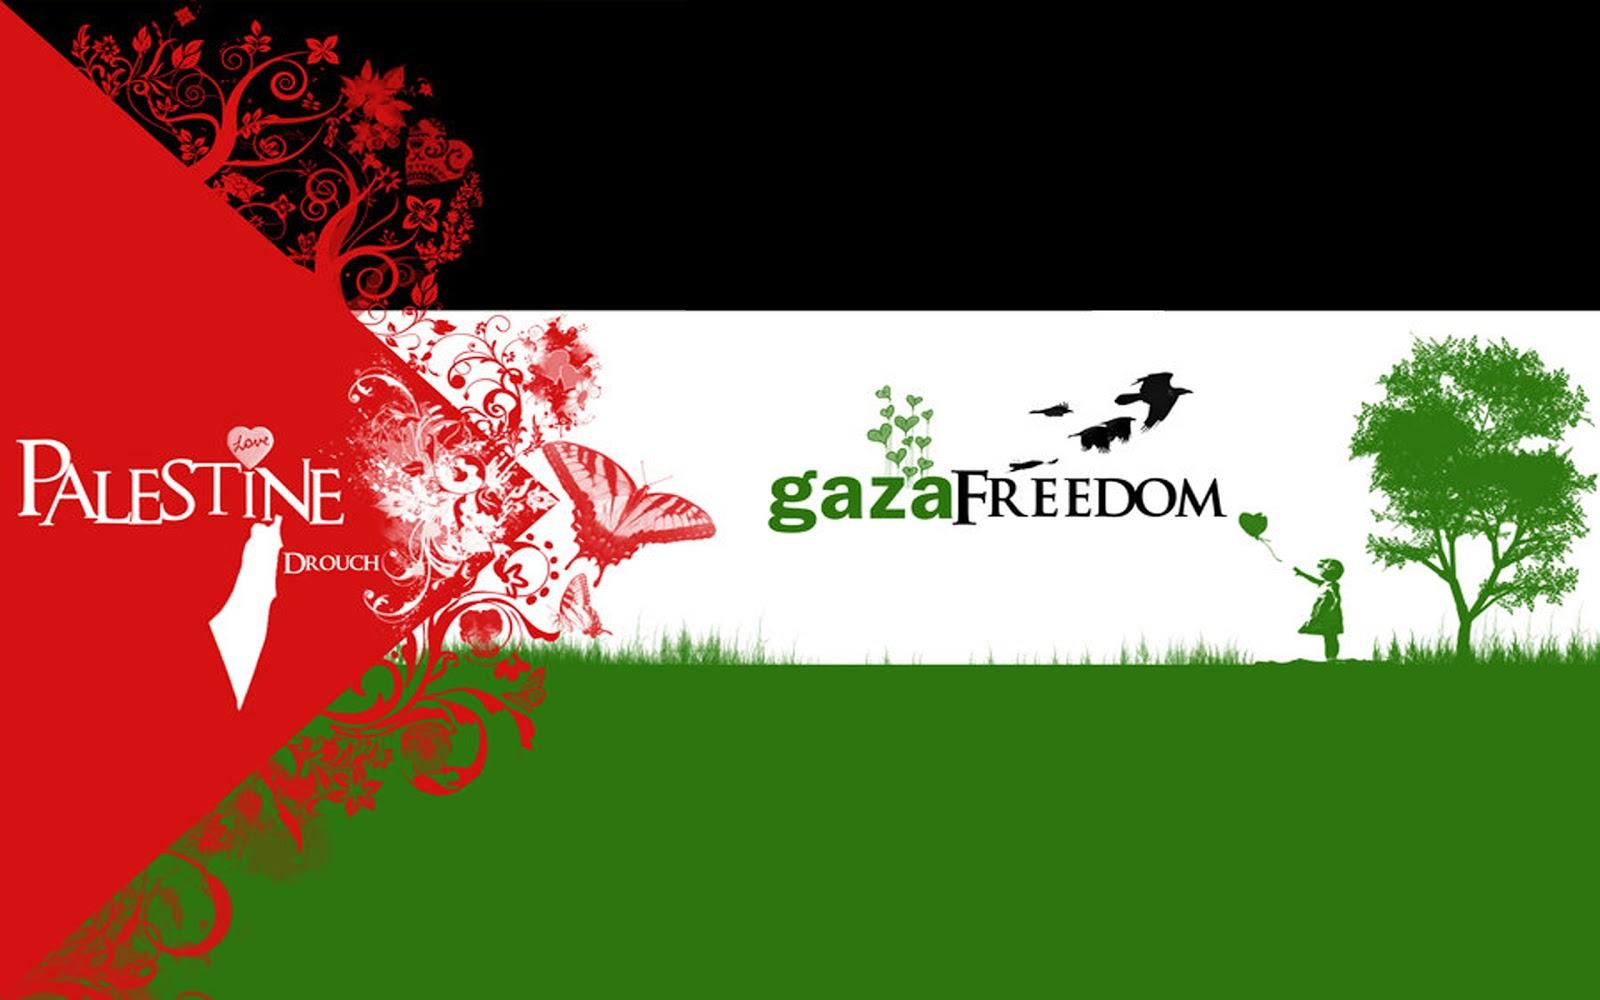 Palestinian Flag Wallpaper Palestine flag wallpaper 1600x1000